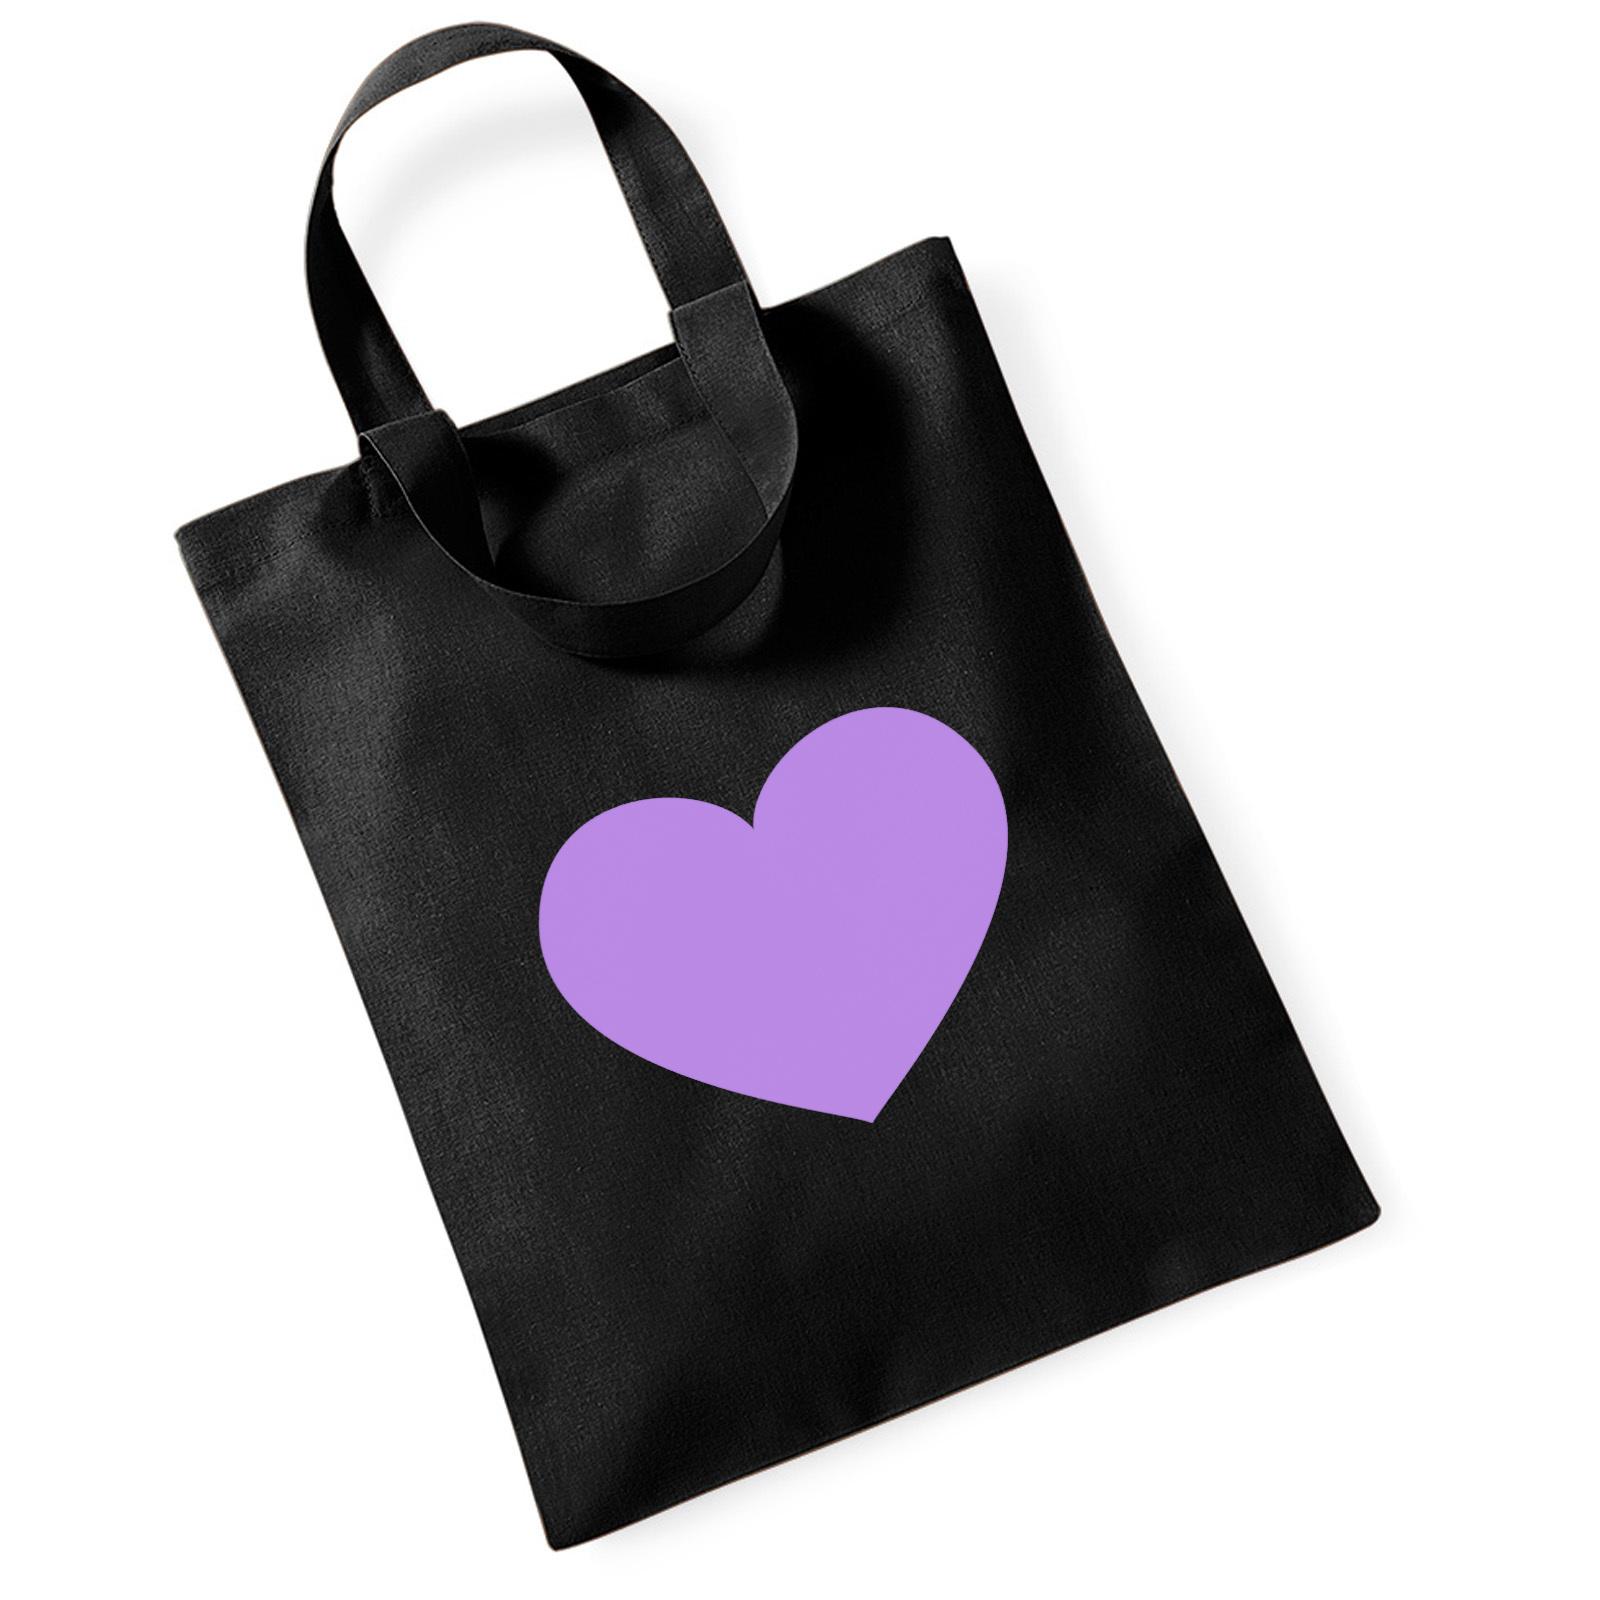 picture of emoji purple heart mini bag for life